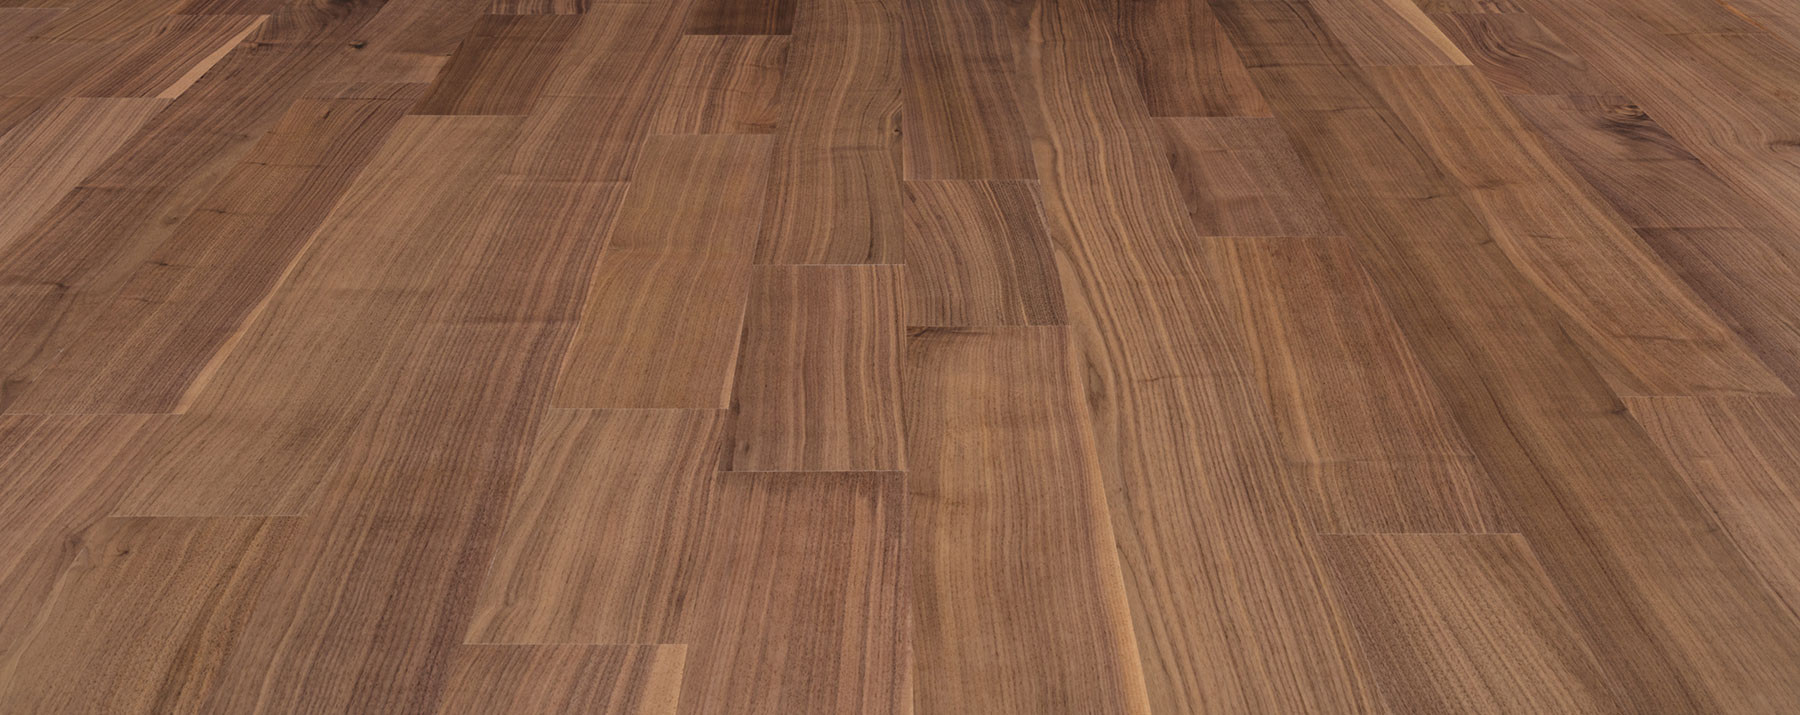 5 16 engineered hardwood flooring of american quartered walnut 5″ etx surfaces with american quartered walnut 5″ american quartered walnut engineered wood flooring